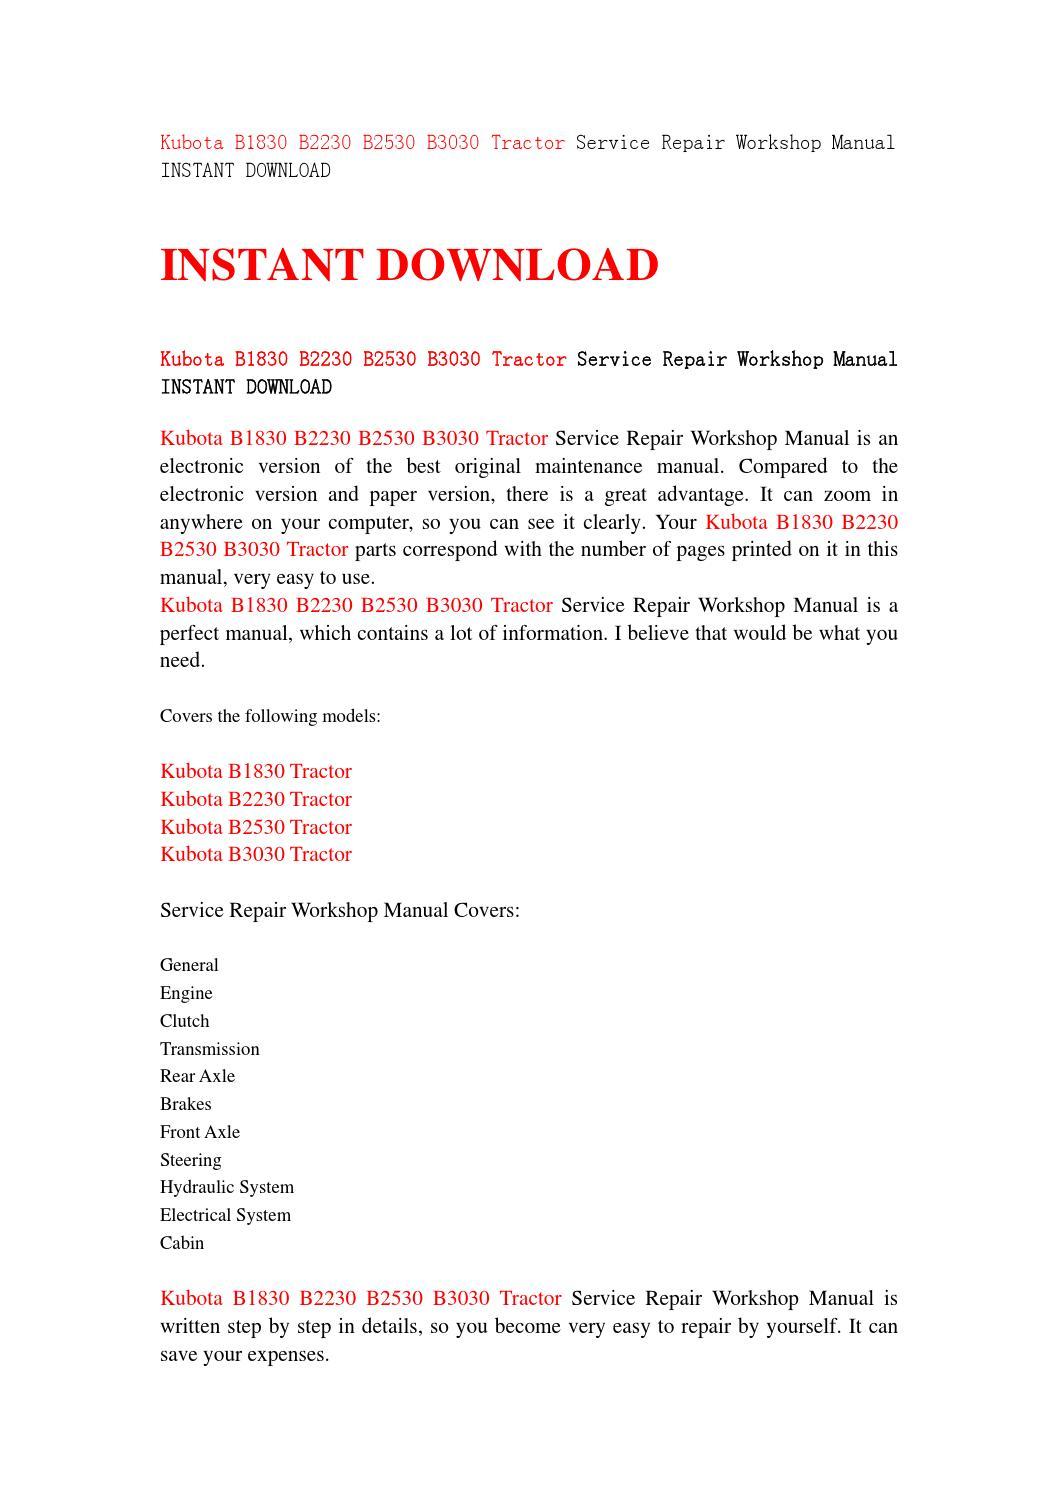 Kubota b1830 b2230 b2530 b3030 tractor service repair workshop manual  instant download by jjshefnsnef - issuu